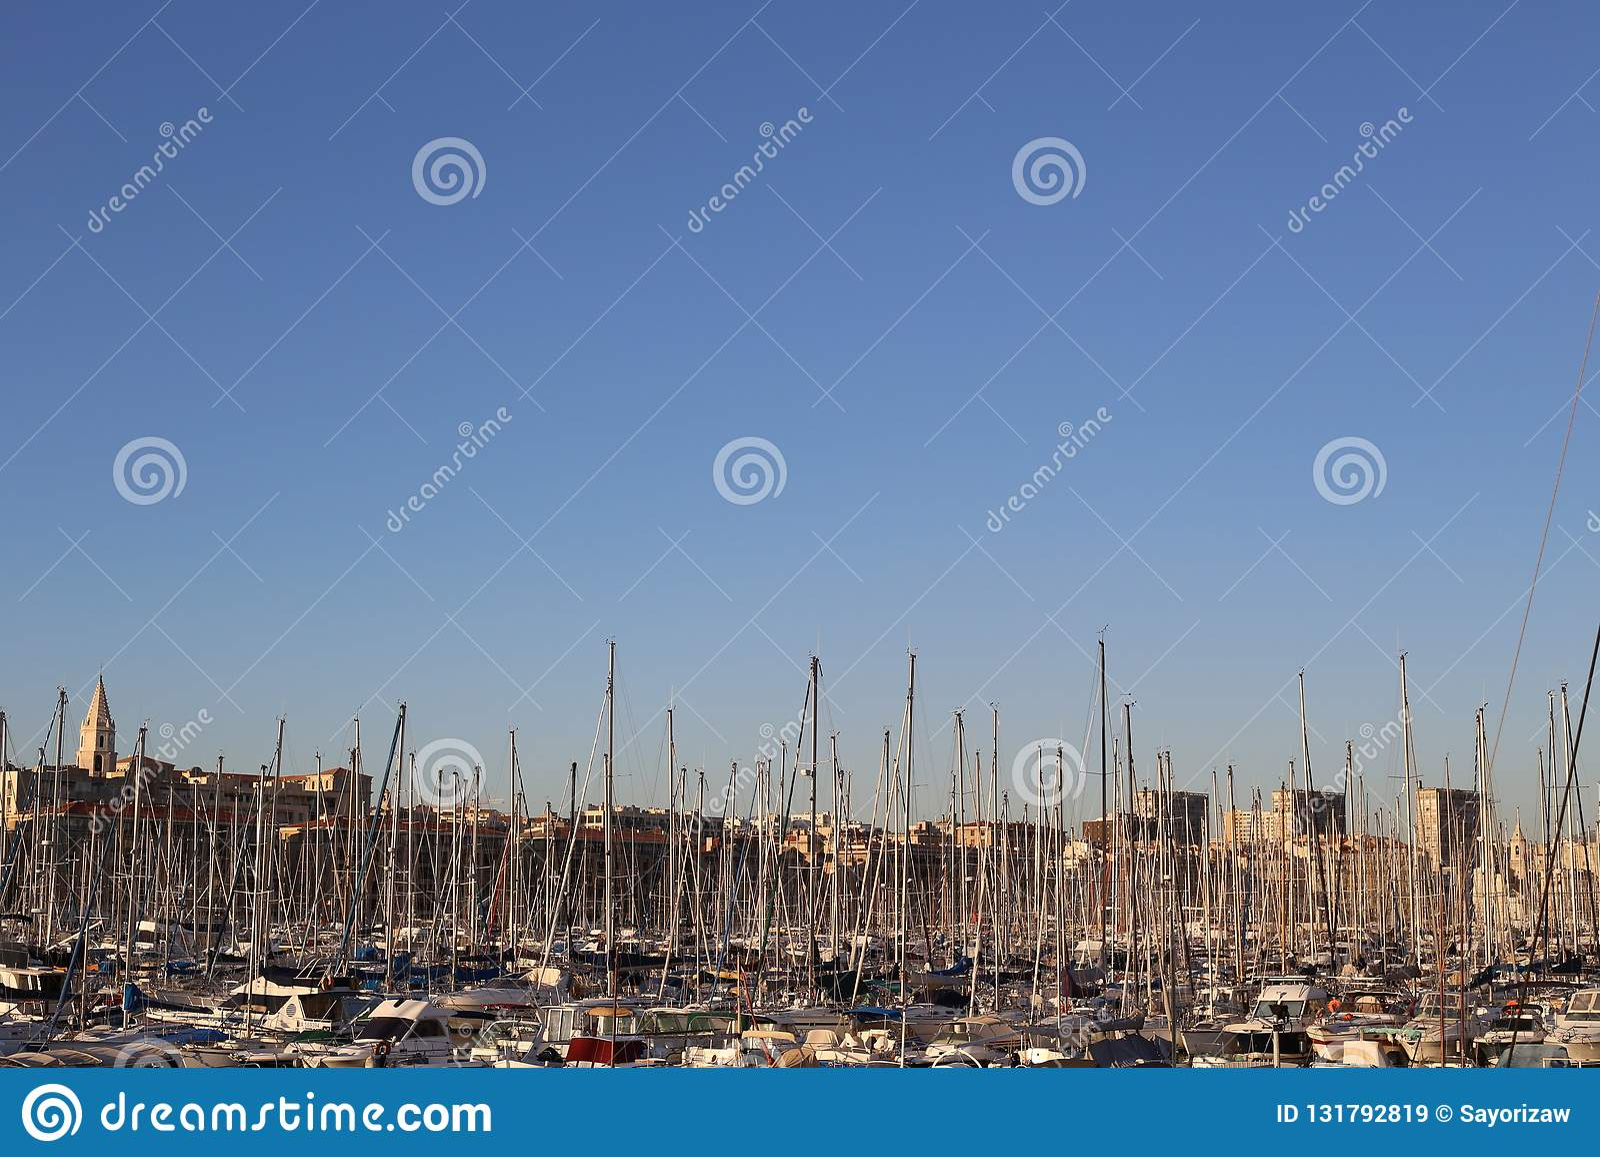 Vieux-λιμένας de Μασσαλία στον ουρανό